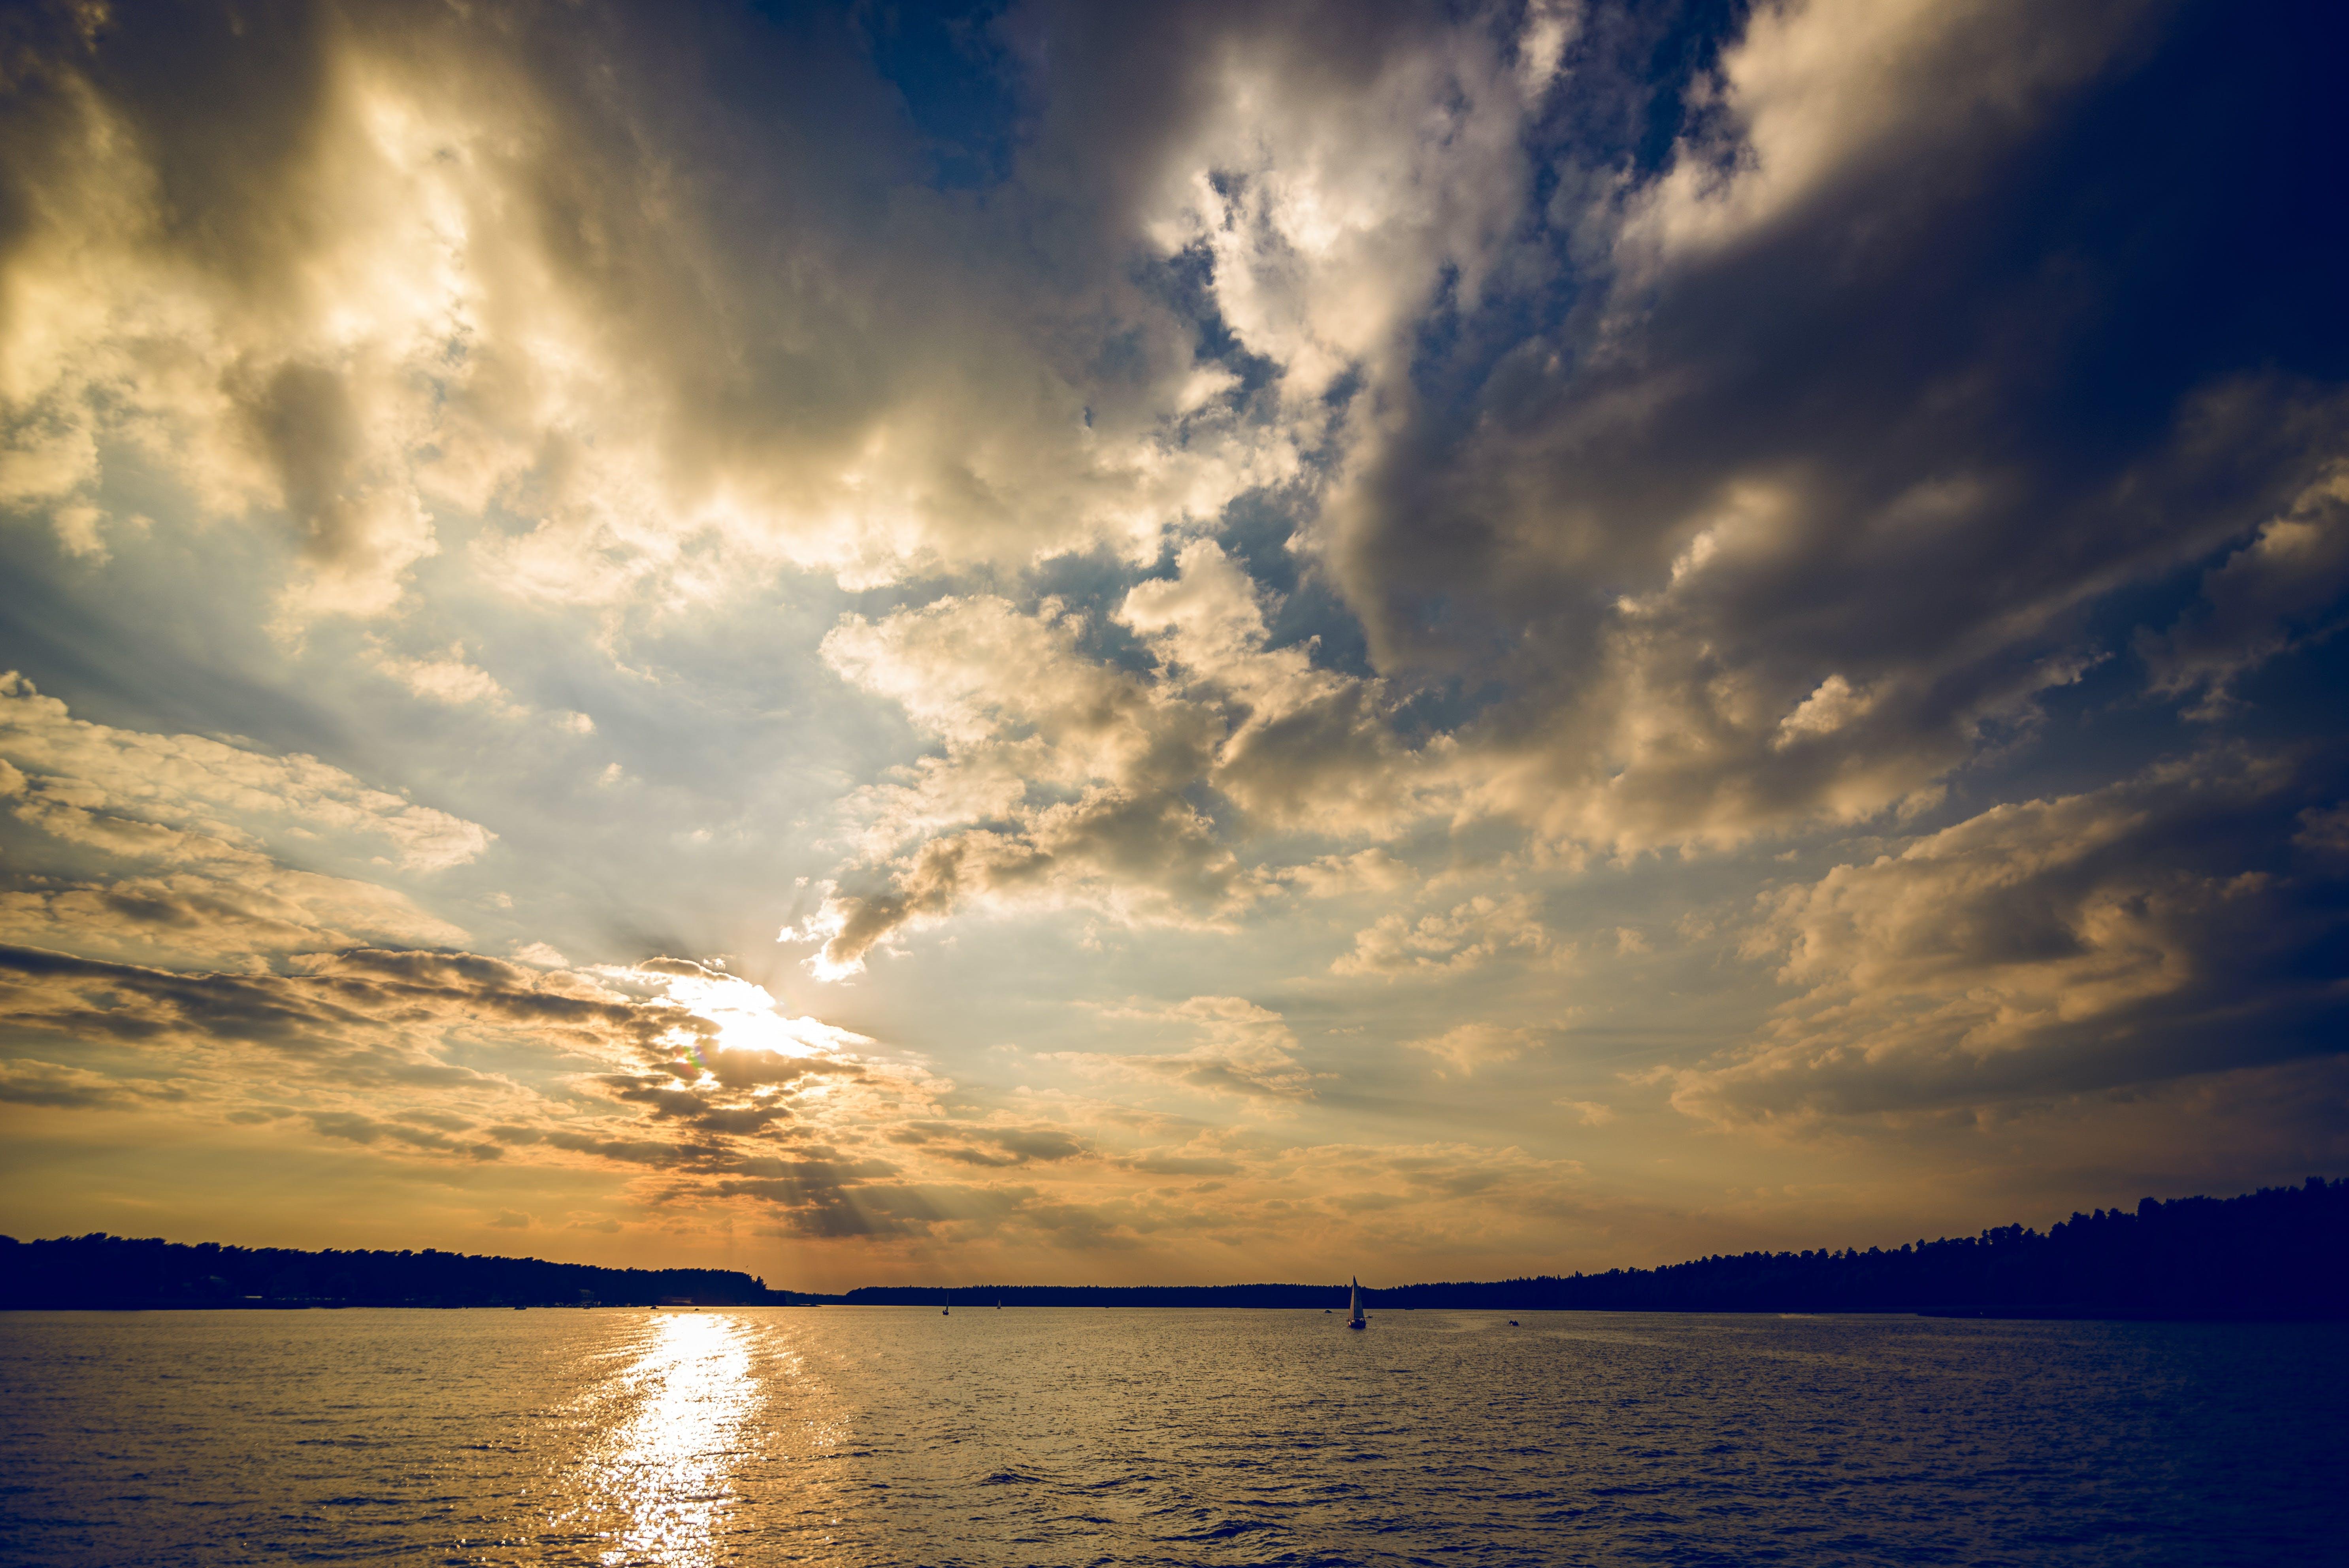 Fotos de stock gratuitas de agua, amanecer, azul, cielo